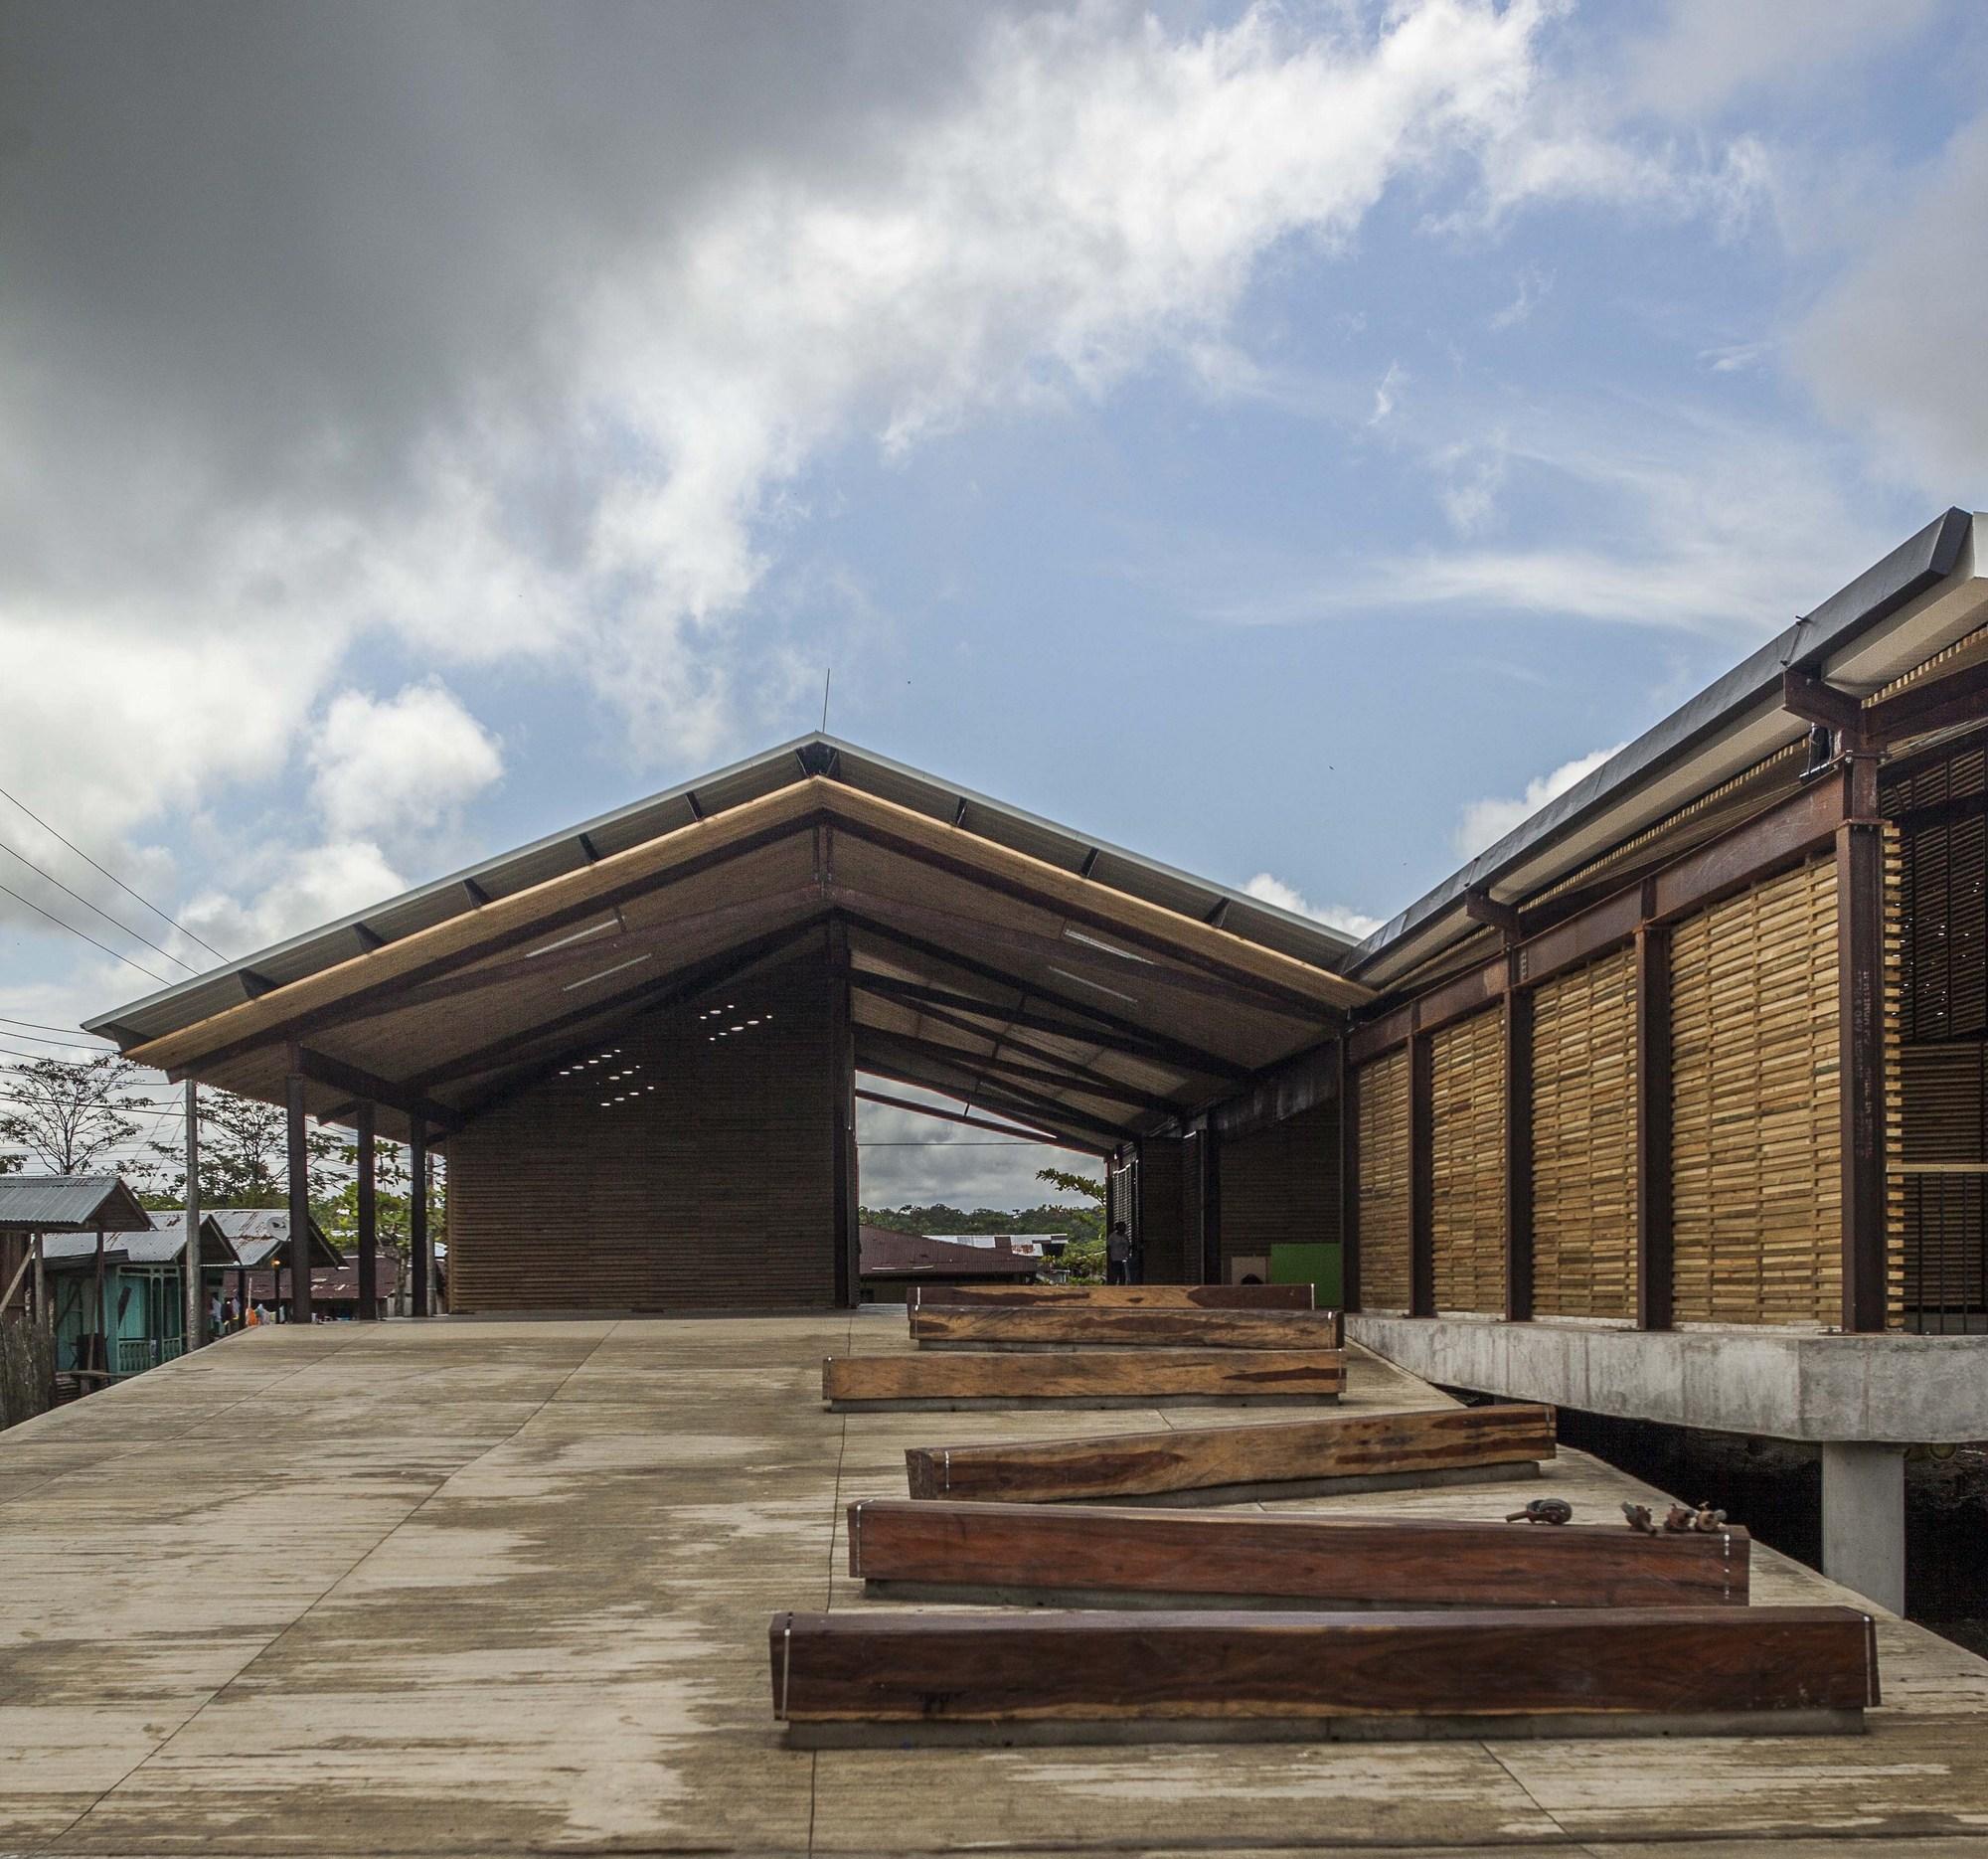 Parque educativo saberes ancestrales mauricio valencia for Arquitectura de proyectos